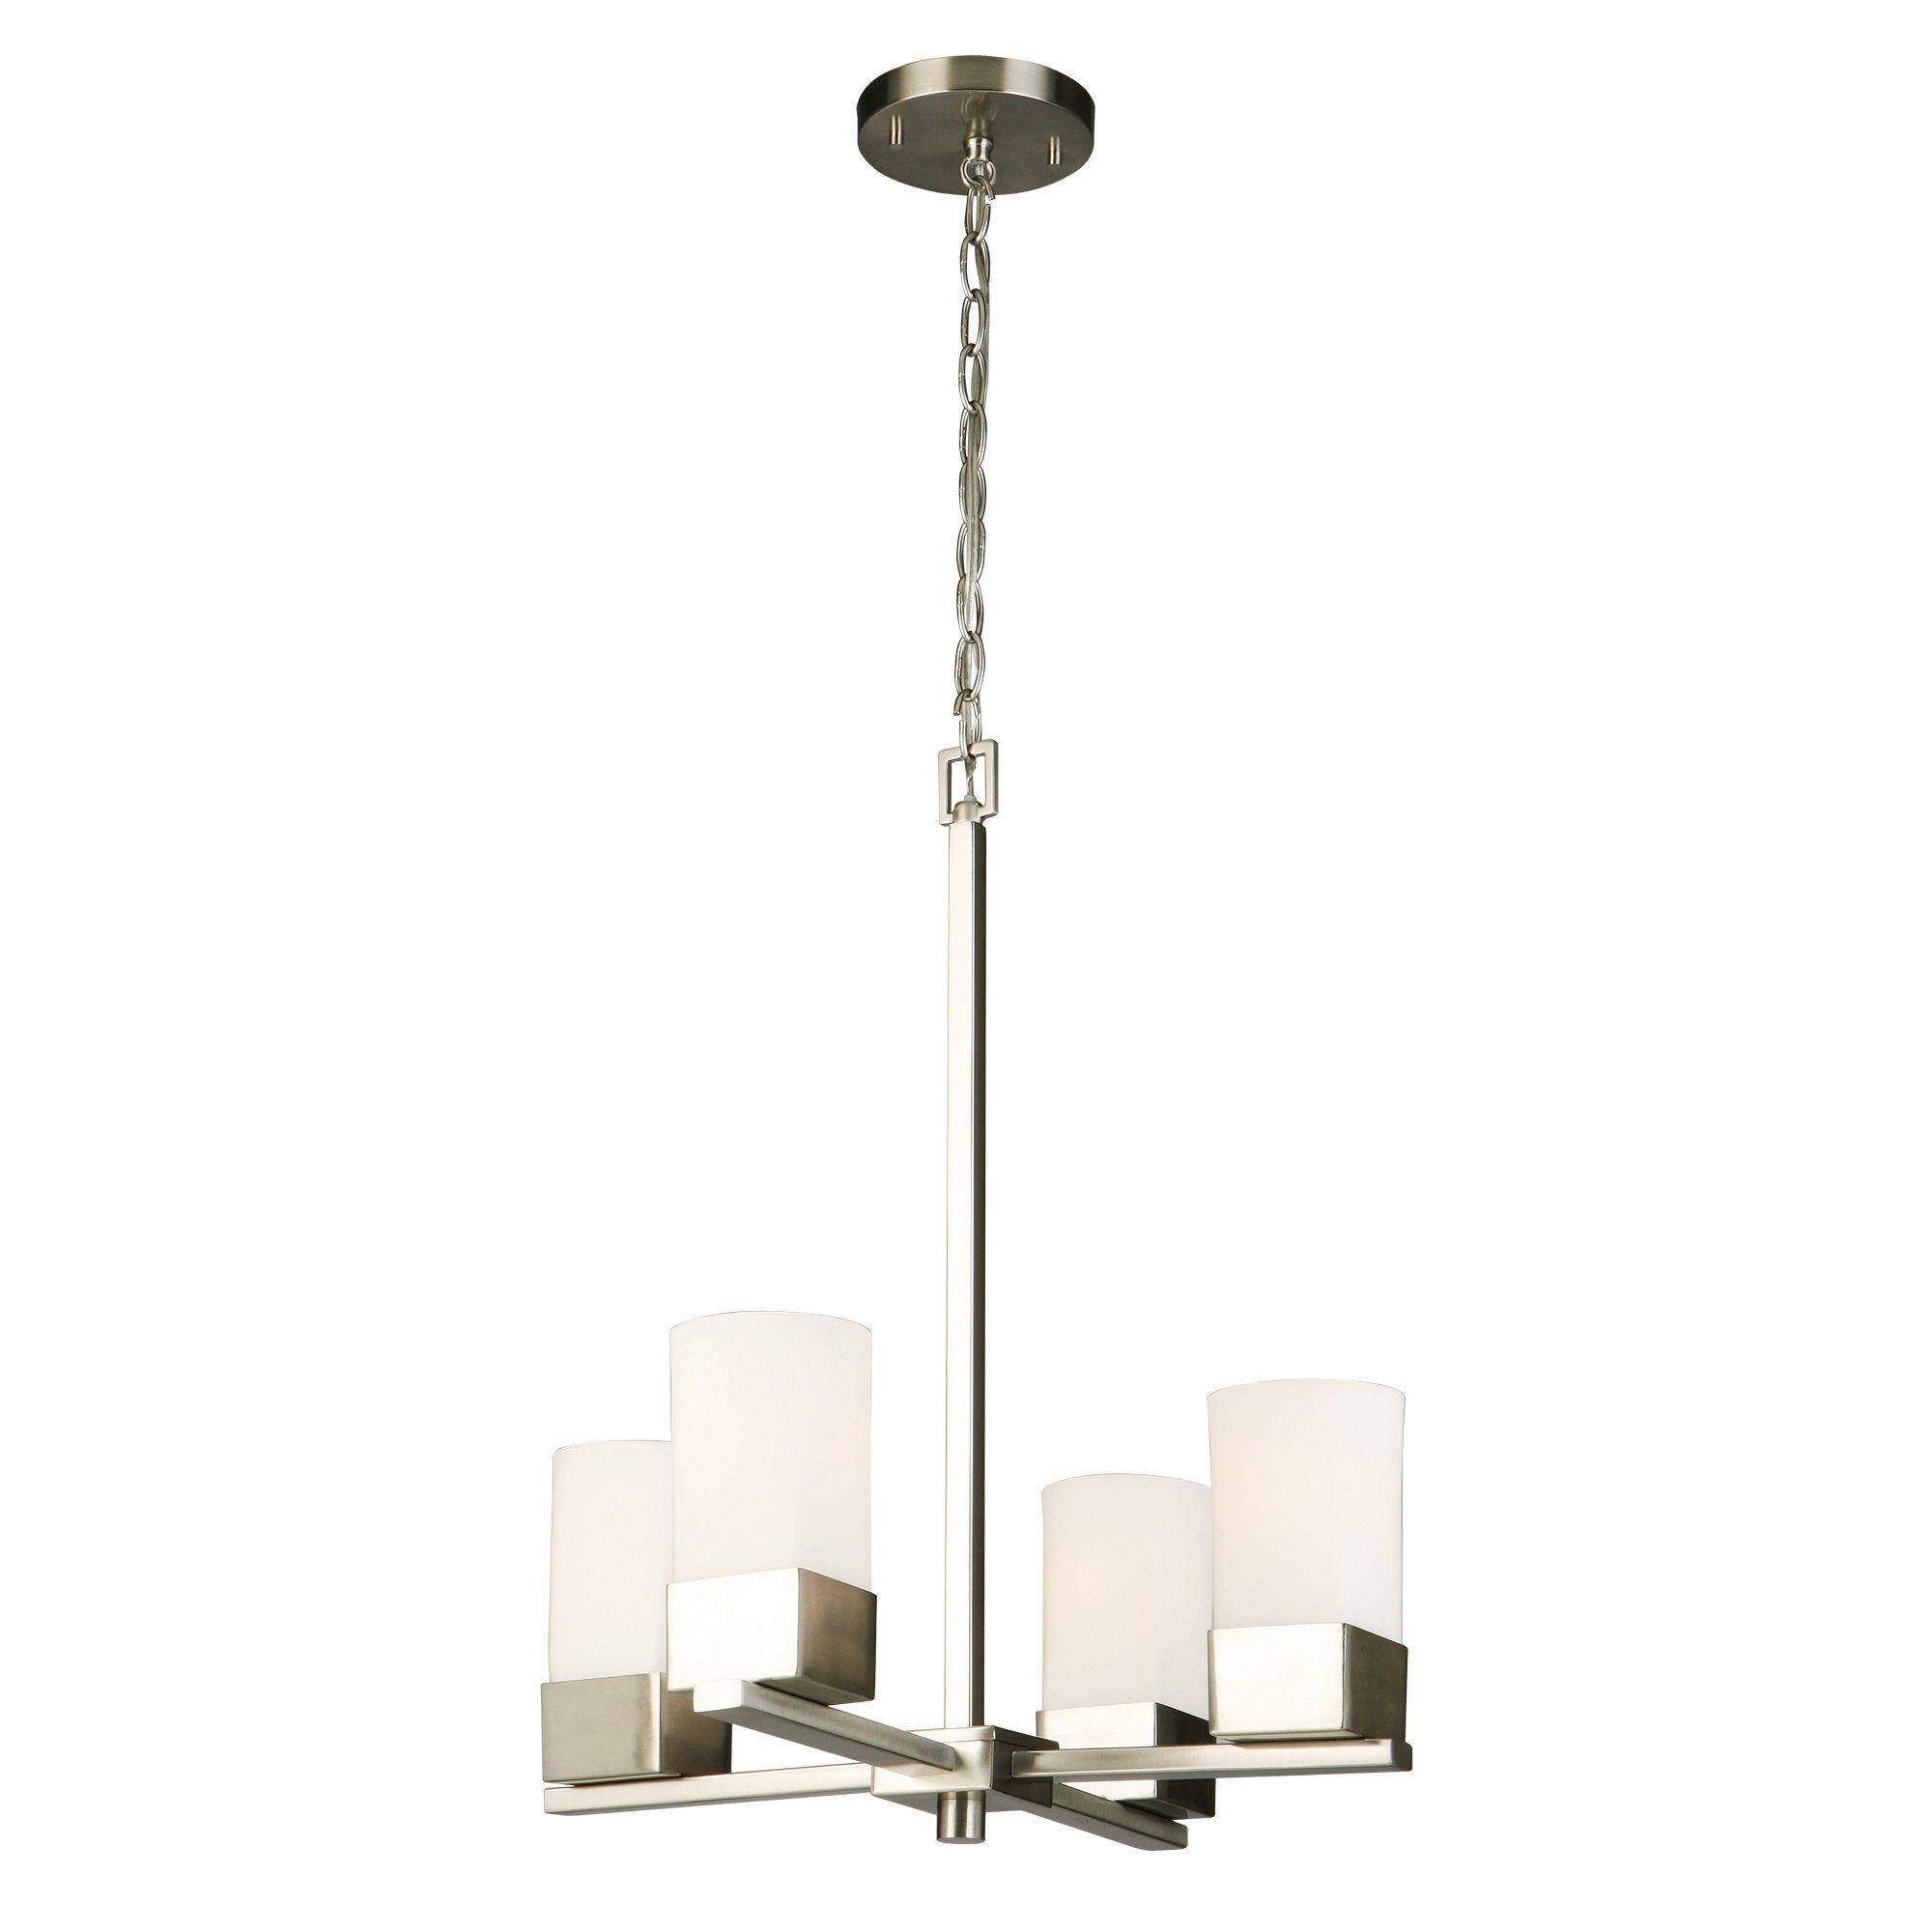 Eglo ciara springs oil rubbed bronze steel 4 light chandelier silver usa